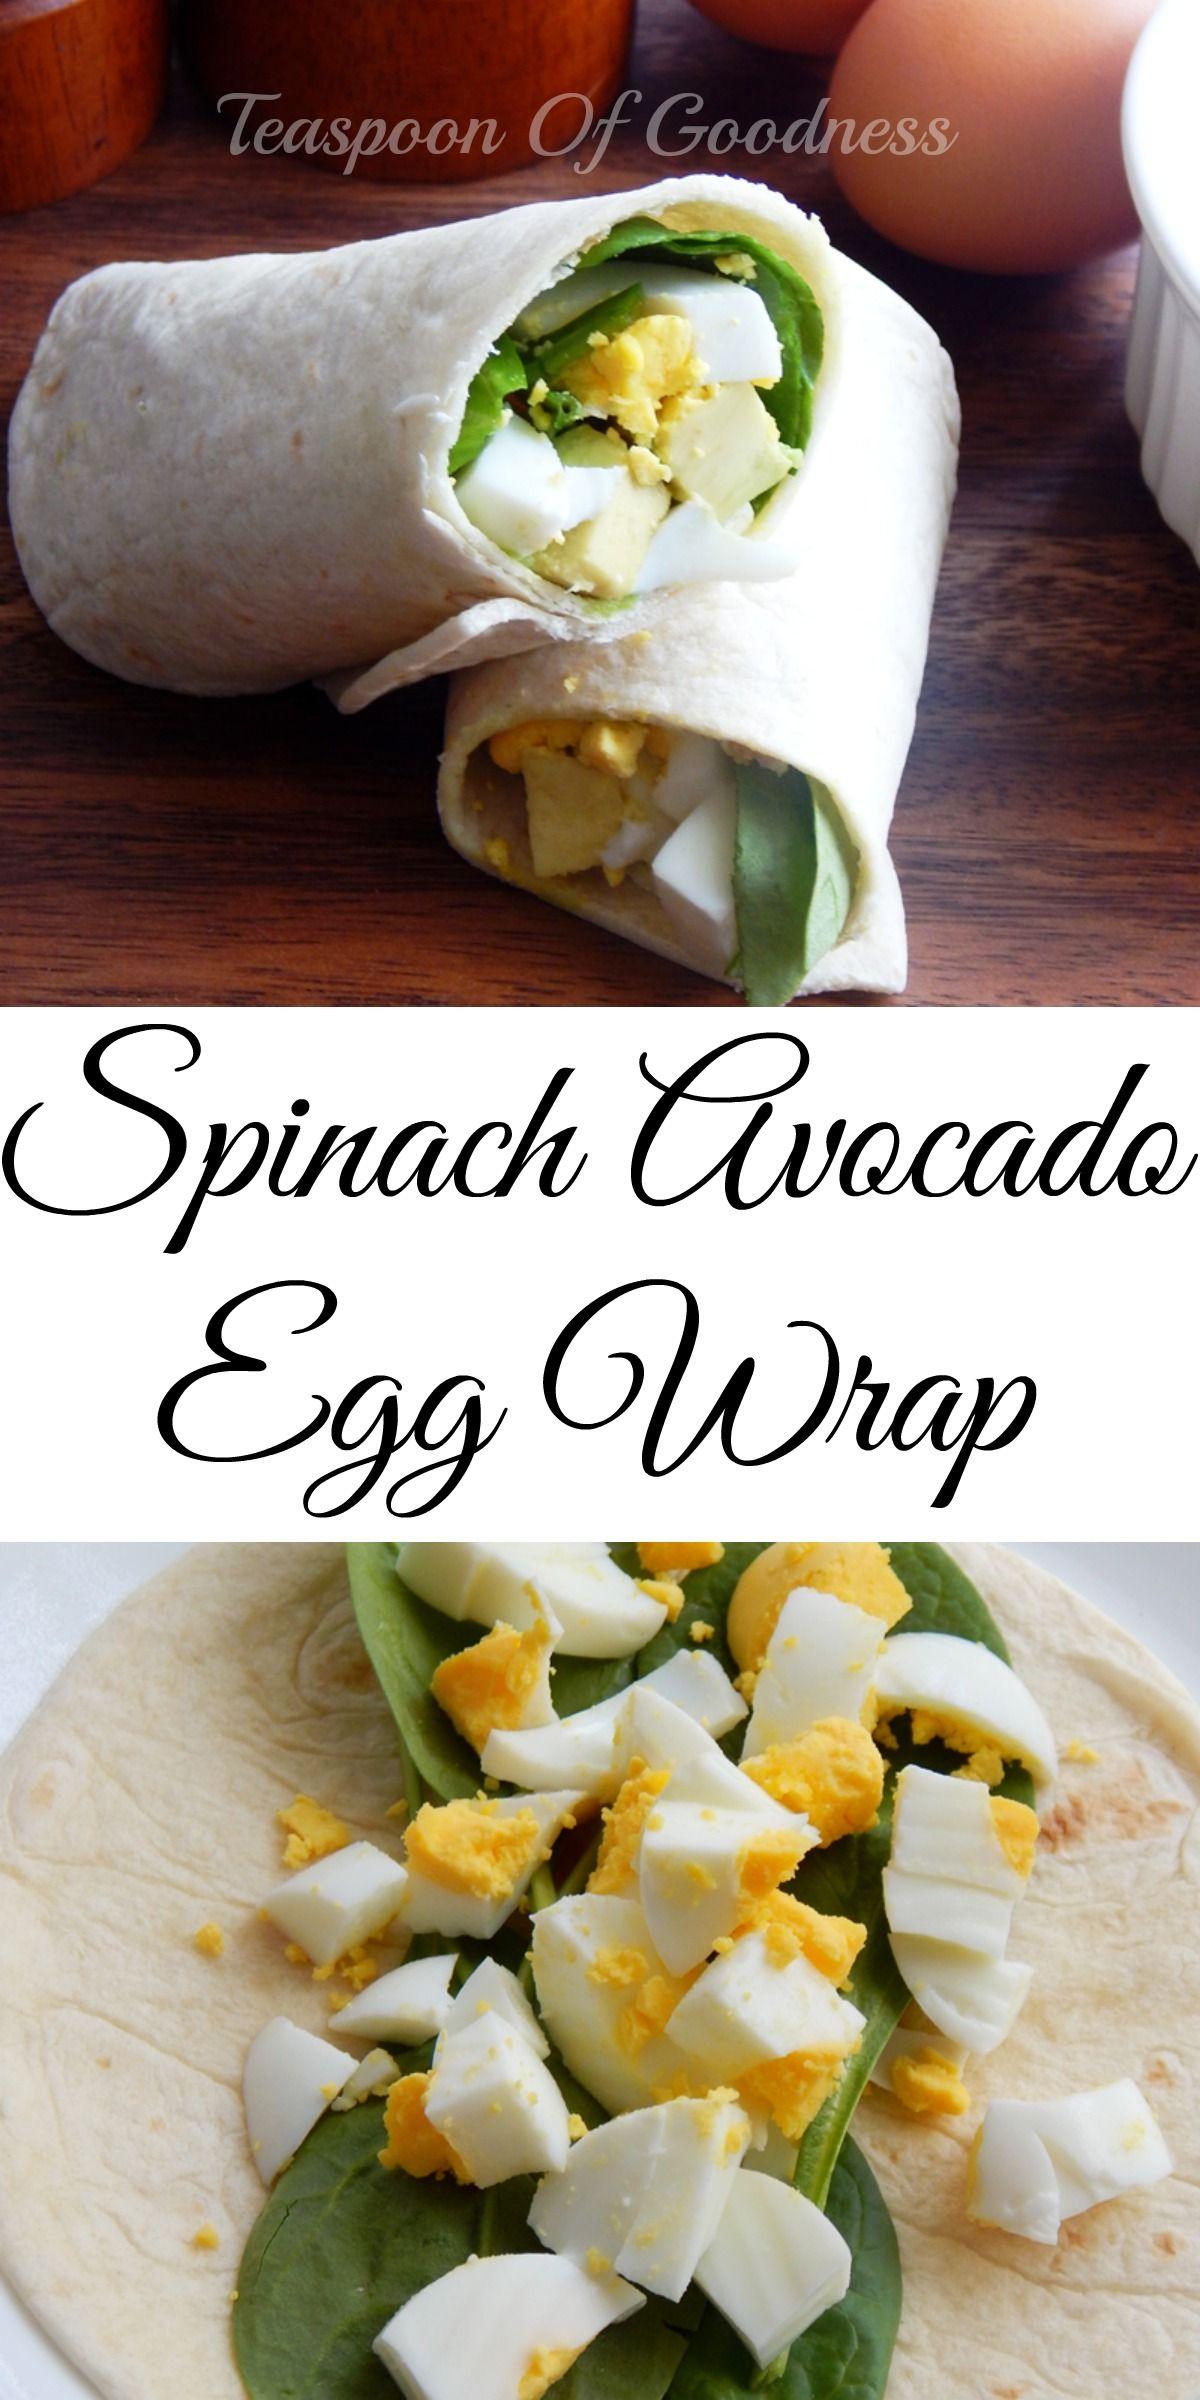 Spinach avocado egg wrap recipe egg wrap avocado egg and spinach avocado egg wrap spinach recipesavocado recipeslunch forumfinder Gallery